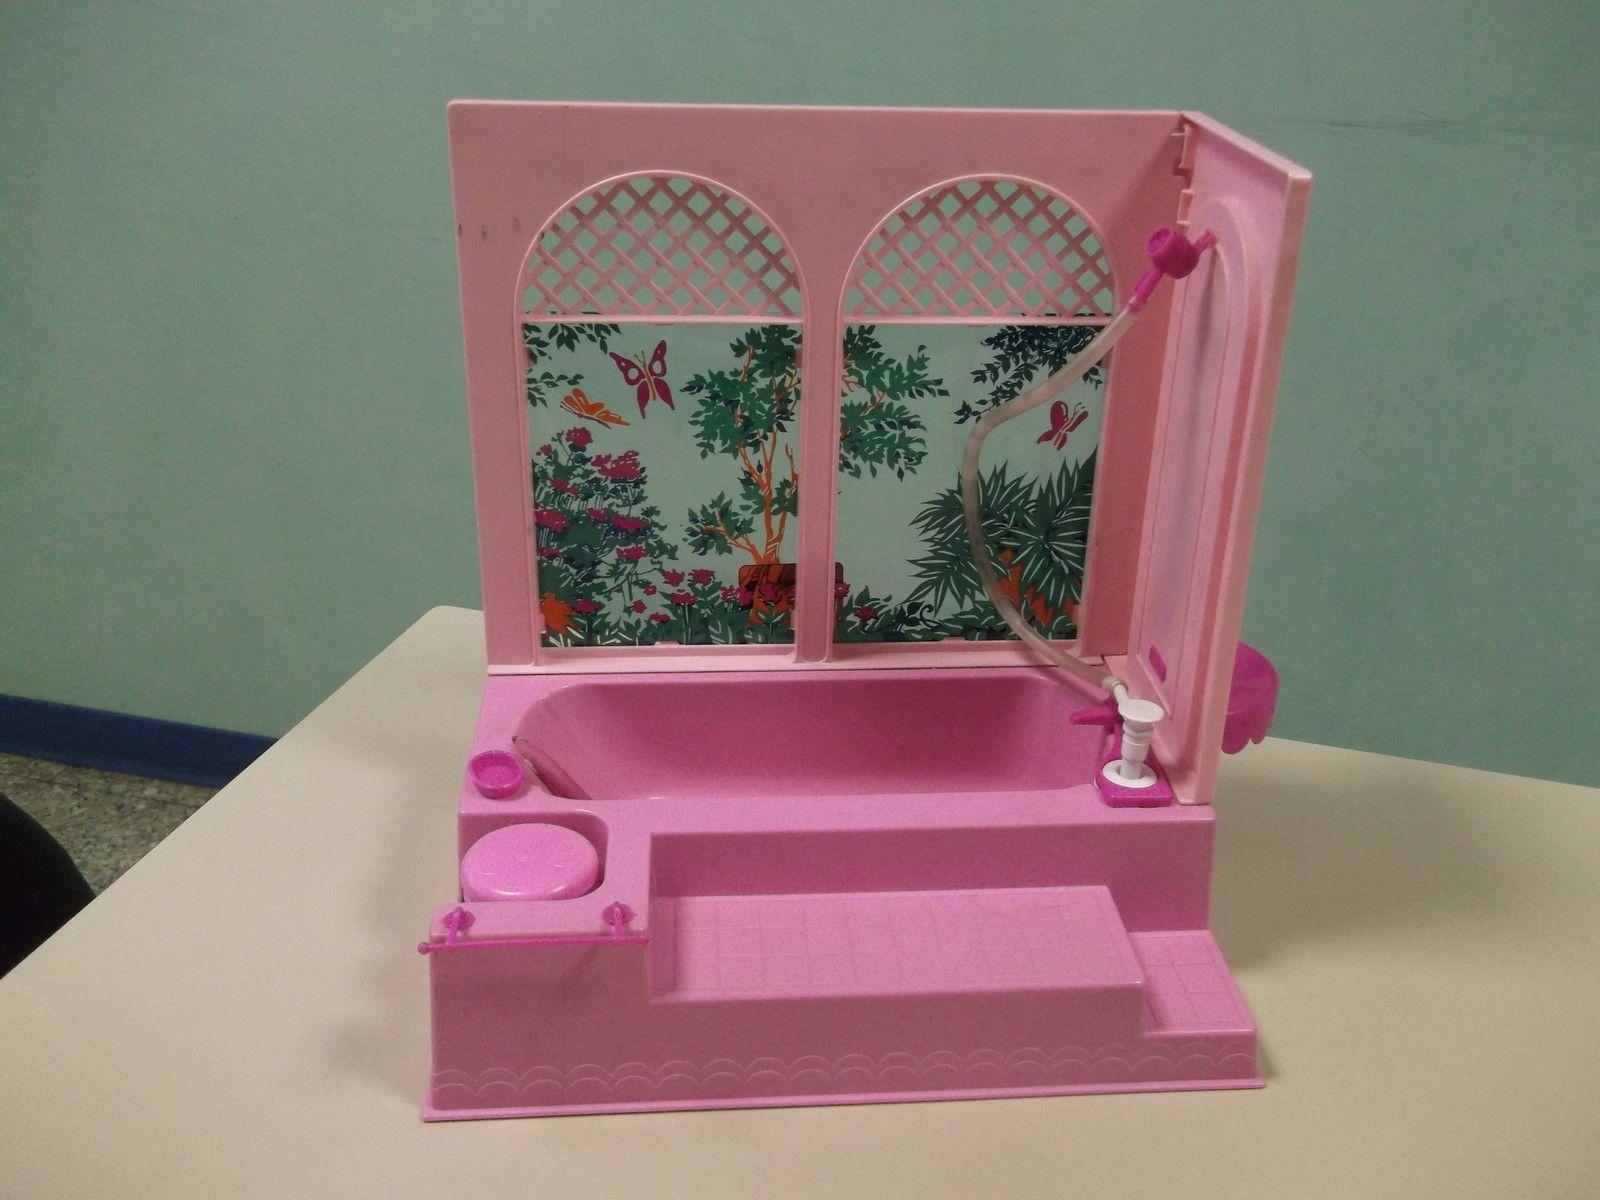 BAGNO BARBIE MATTEL VINTAGE ORIGINALE ANNI 80  eBay  Anni 80  Barbie 80s Childhood memories